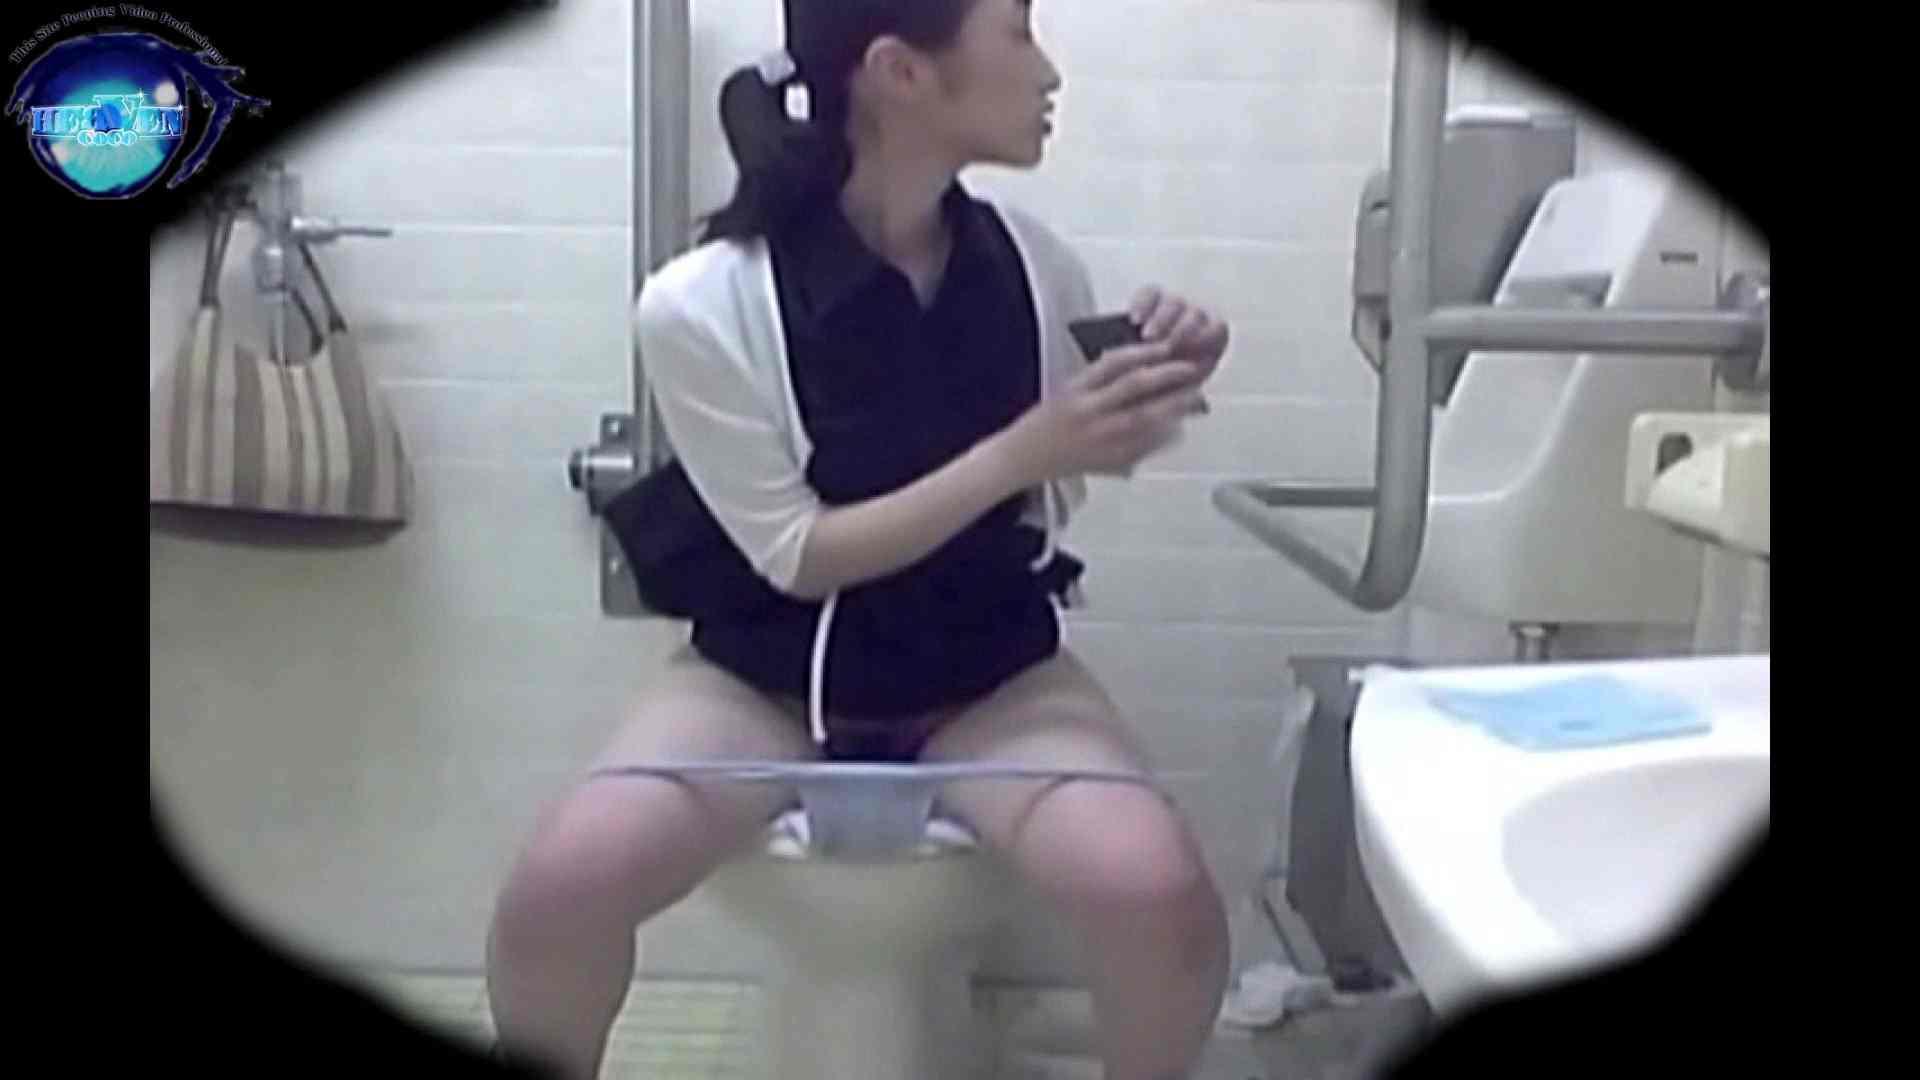 teen galトイレ覗き紙がナイ編‼vol.14 OL女体 濡れ場動画紹介 55連発 42